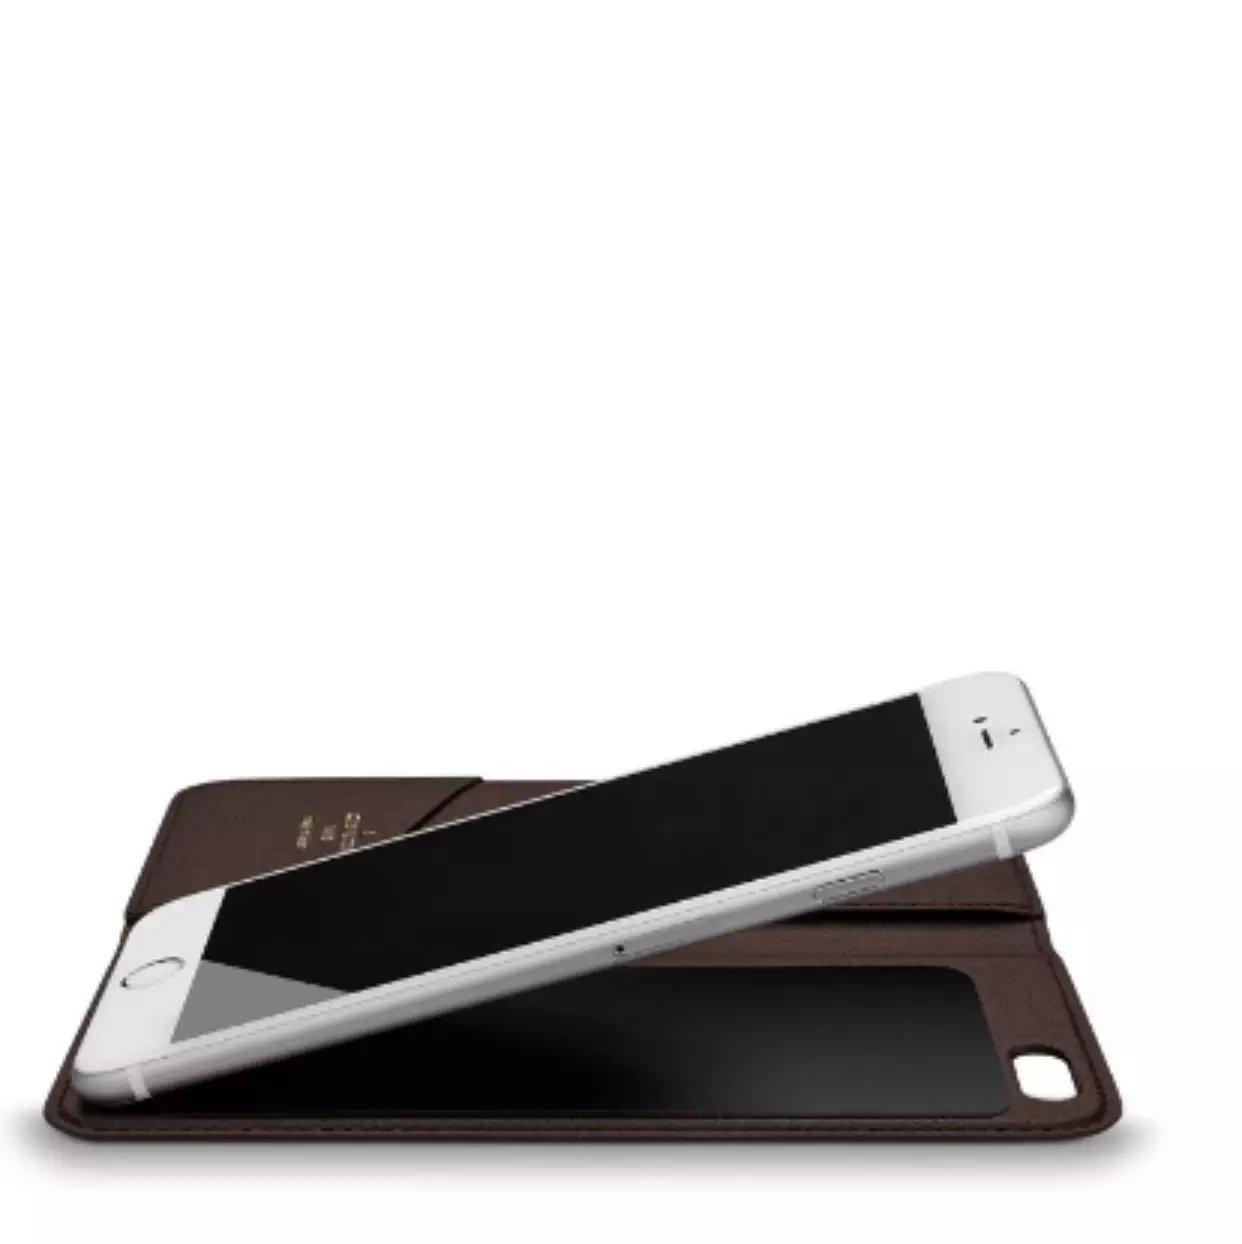 iphone hülle selber gestalten günstig iphone hülle leder Louis Vuitton iphone 8 Plus hüllen handytasche 8 Pluslbst bedrucken apple iphone 8 Plus zubehör cover für handy 8 Pluslbst gestalten handy hülle silikon iphone tasche 8 Pluslbst gestalten iphone 8 Plus ilikon